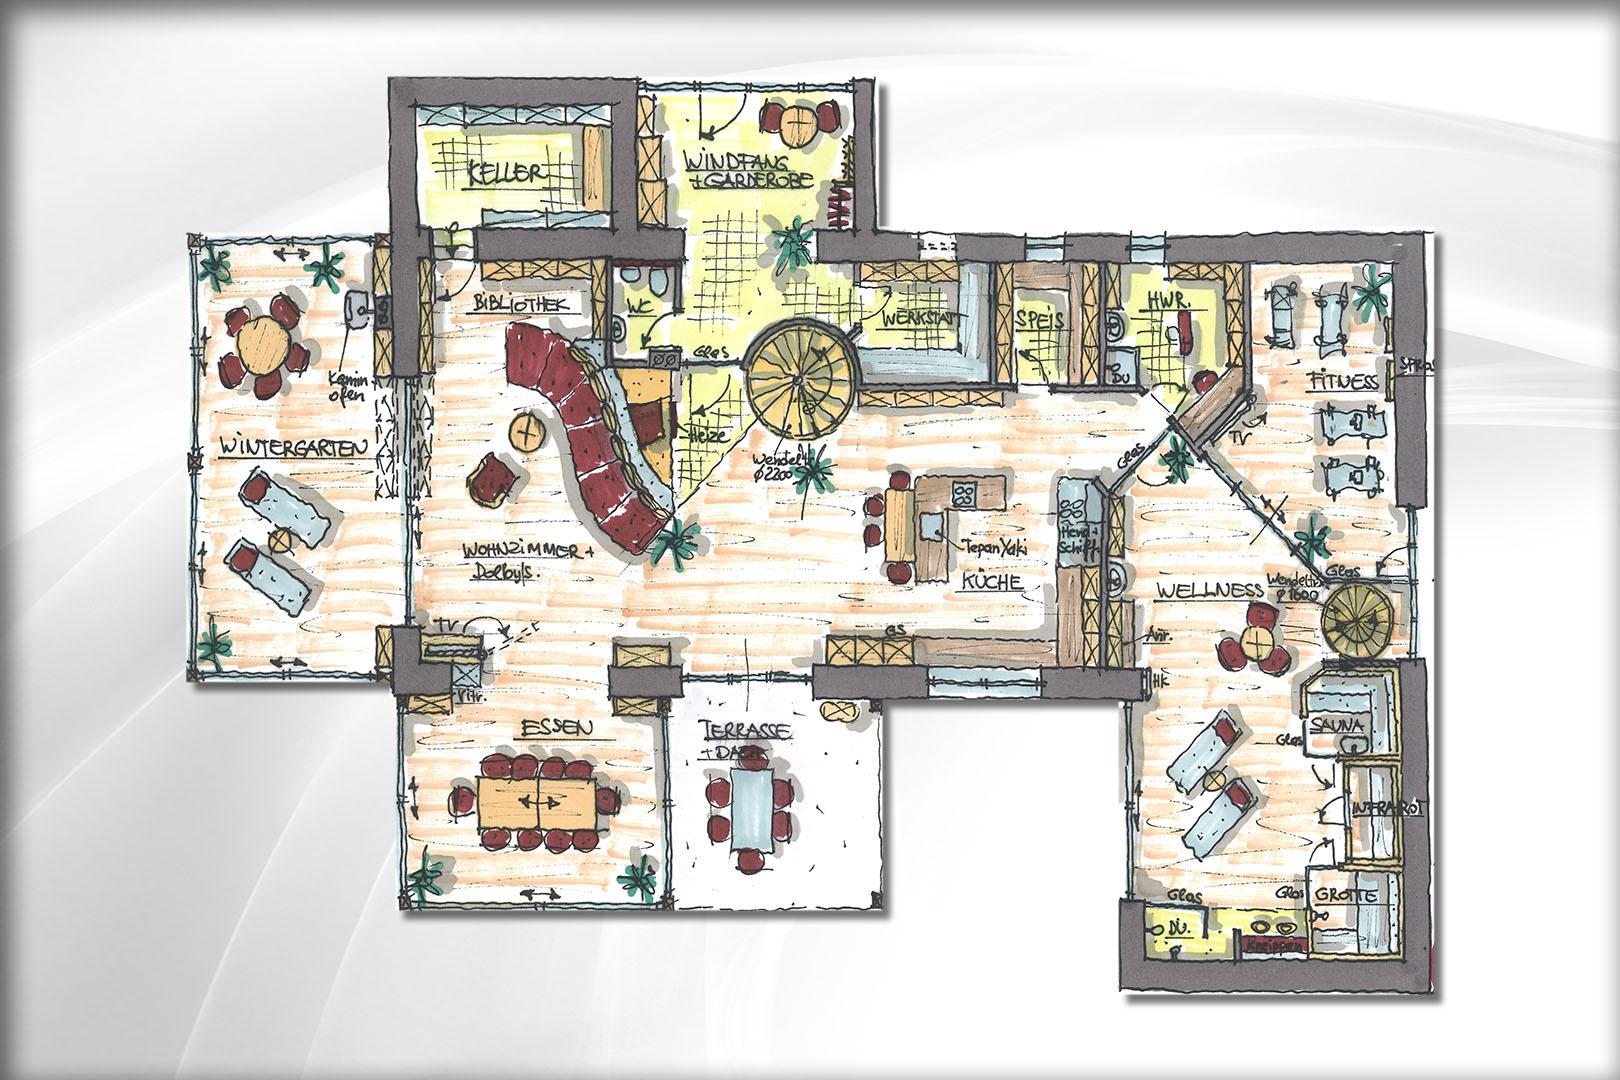 Wohn design ideenpavillon for Wohndesign einrichtungs gmbh wels